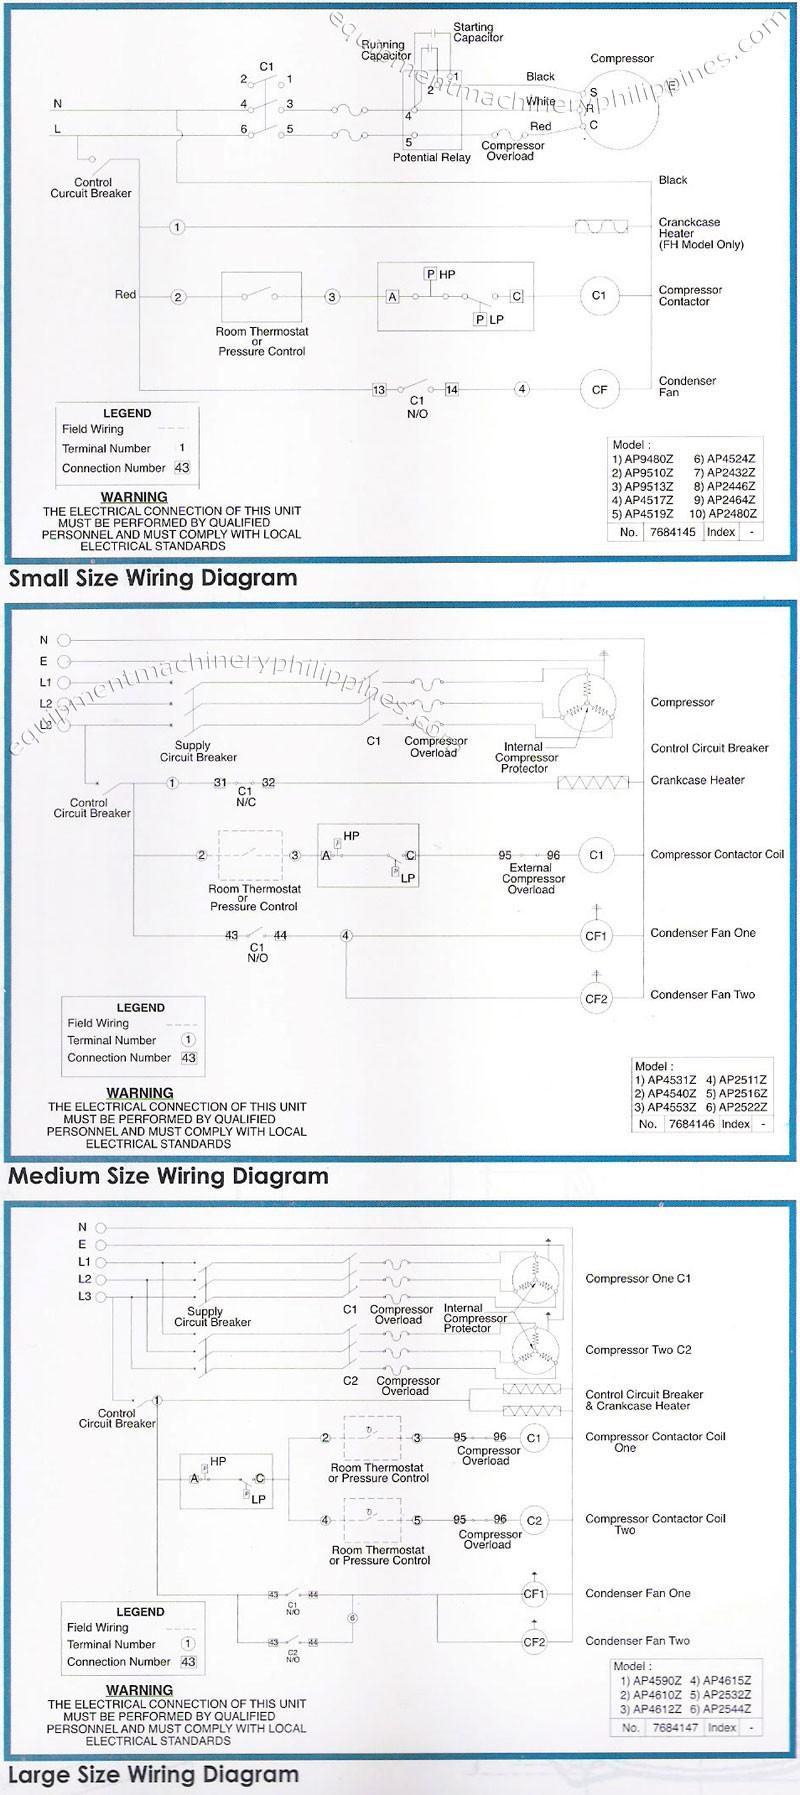 05 Tecumseh Packaged Refrigeration Condensing Unit Wiring Diagram